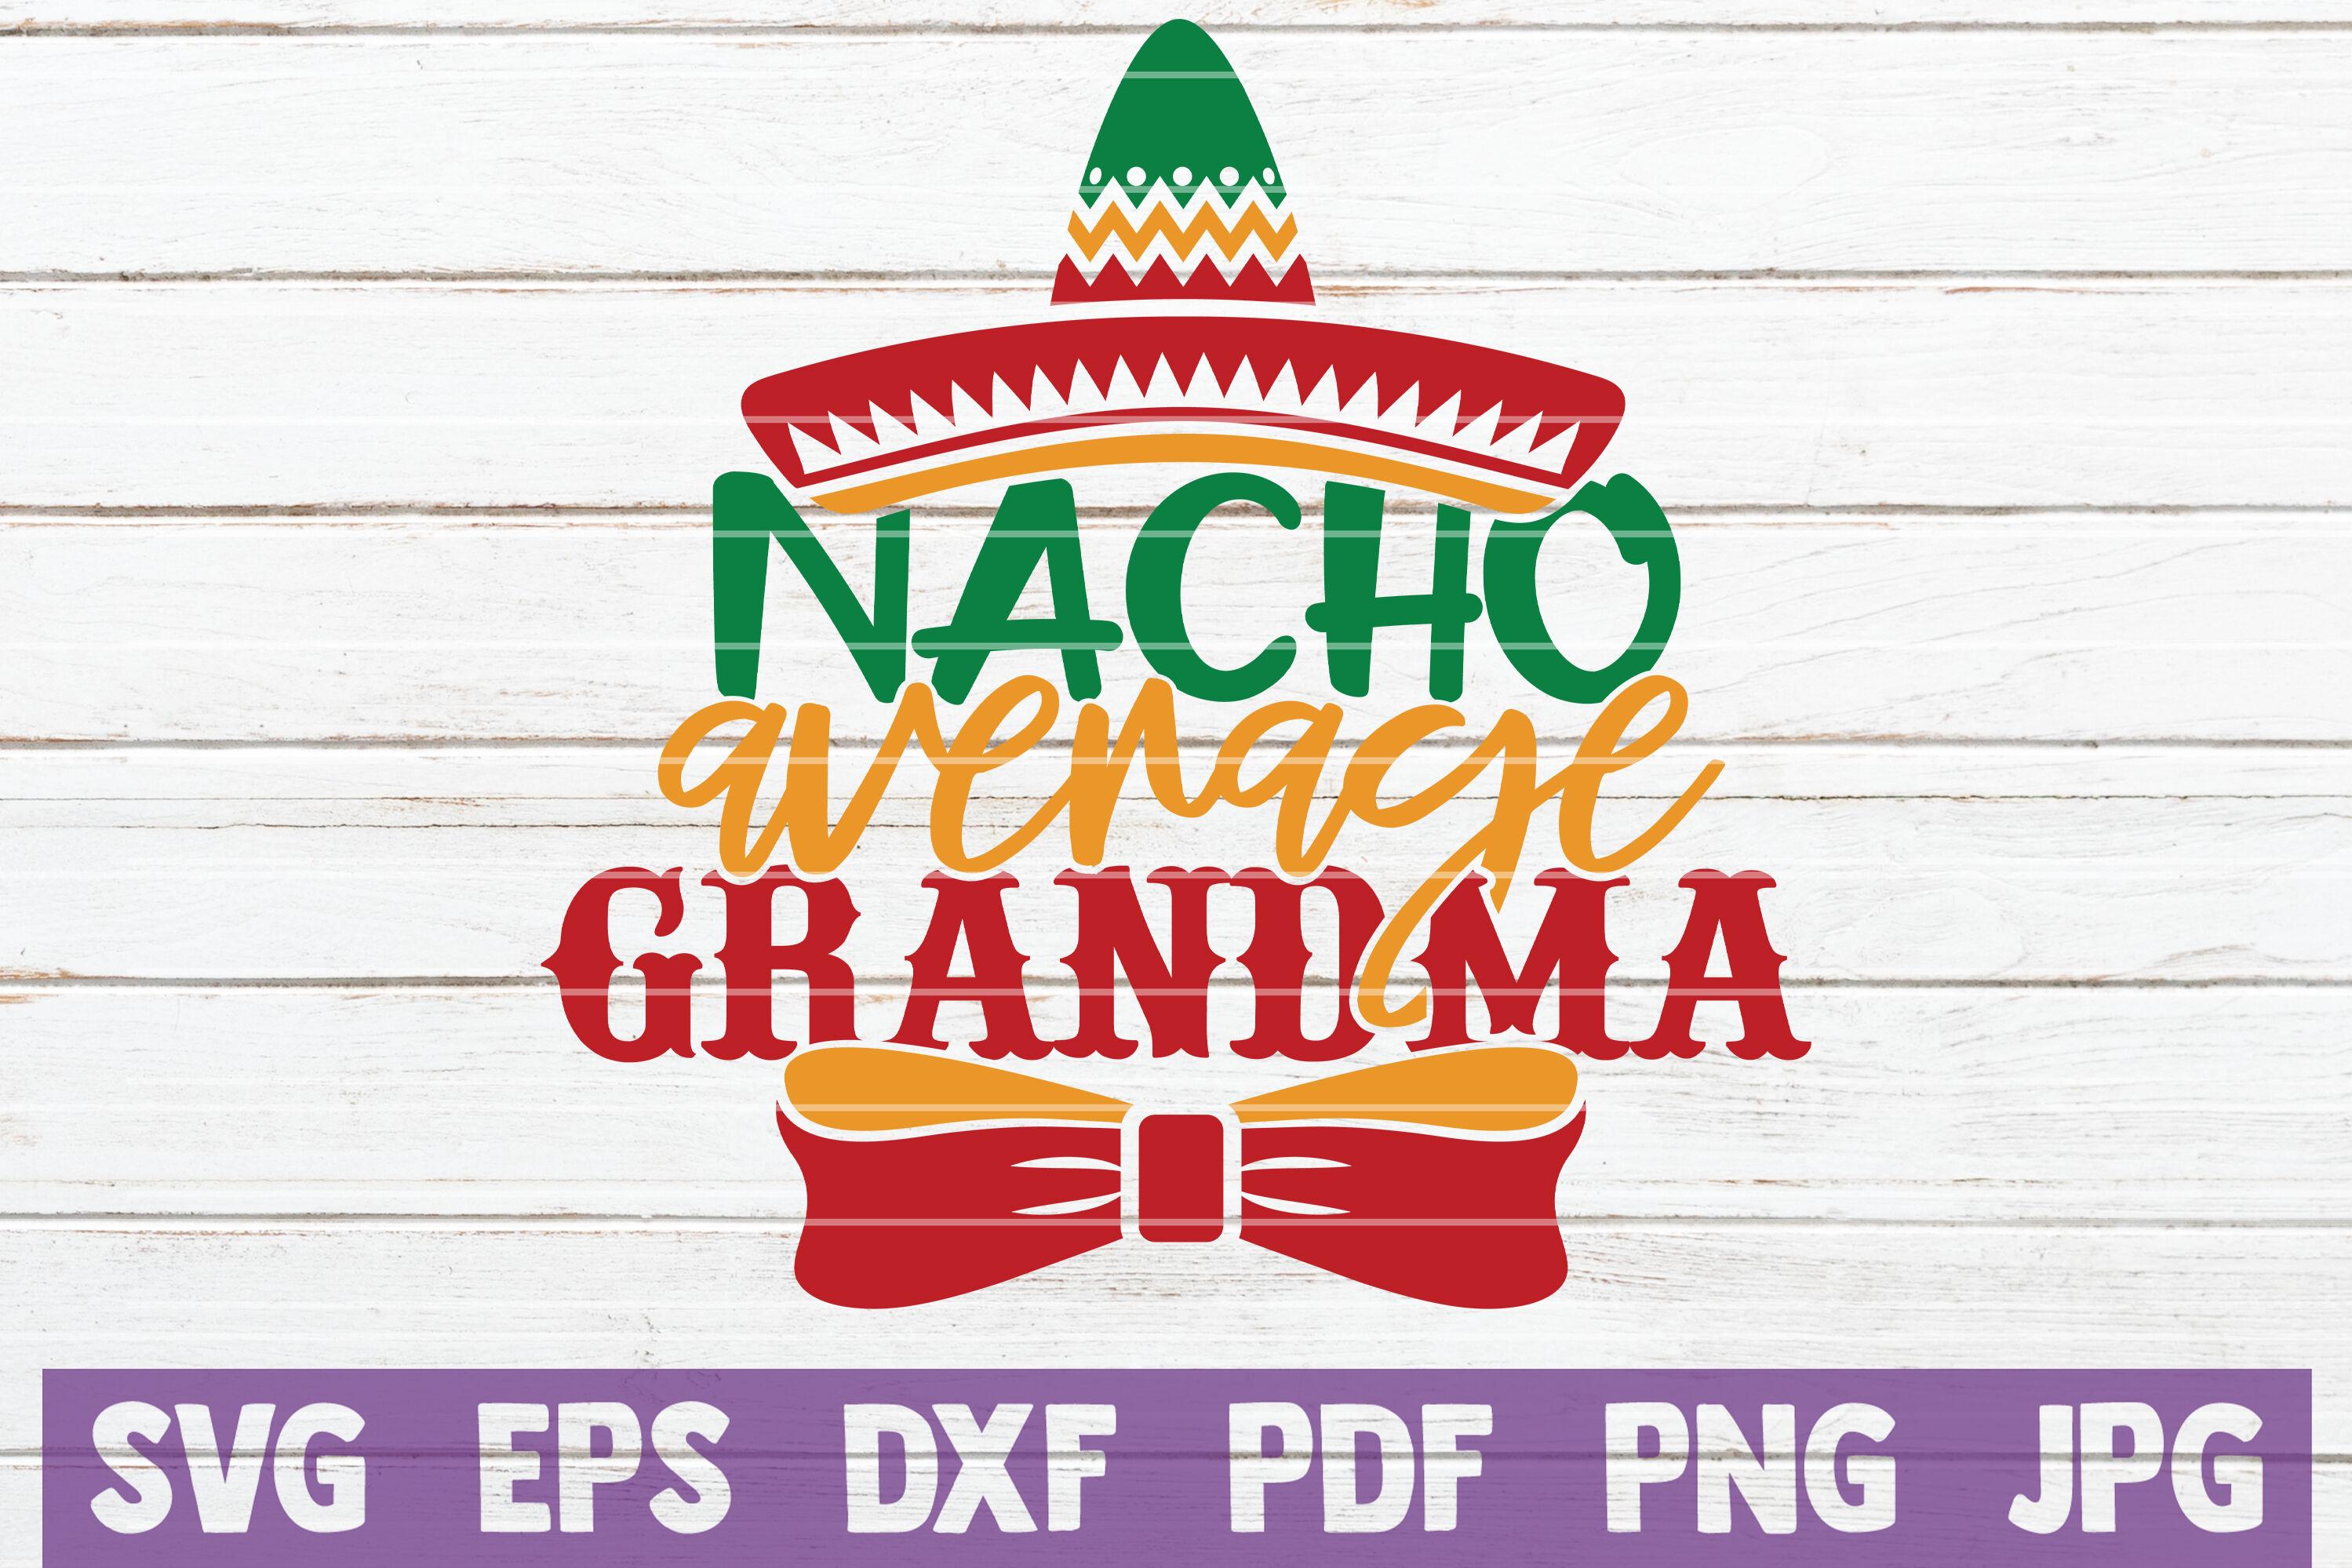 Nacho Average Grandma Svg Cut File By Mintymarshmallows